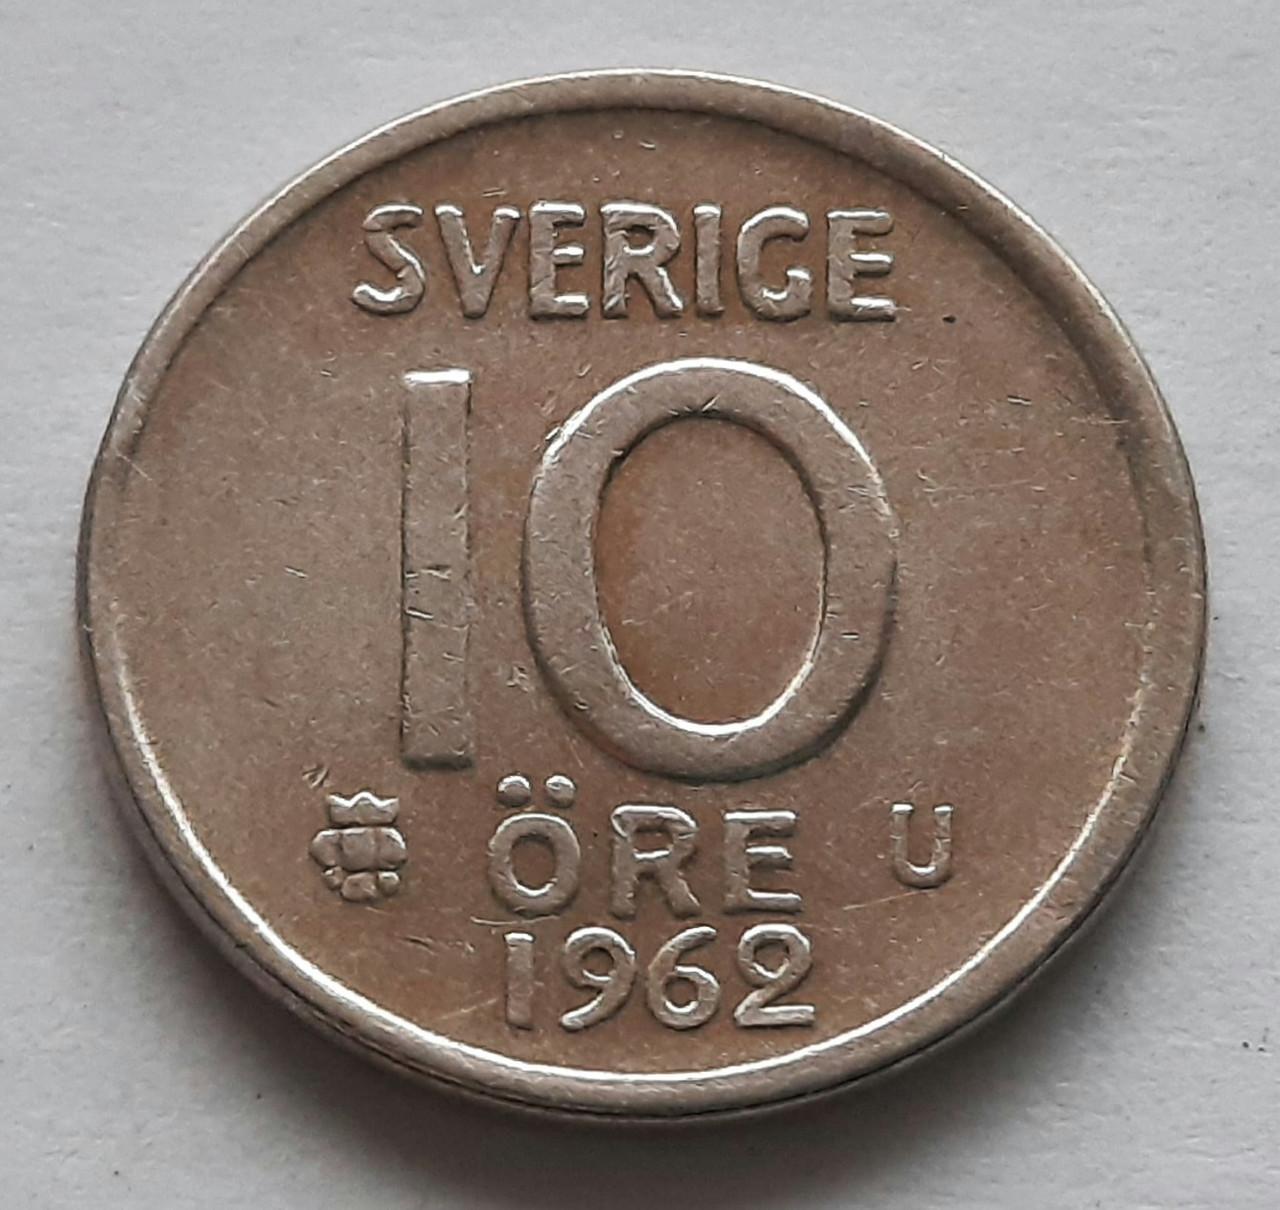 Швеция 10 эре 1962 Серебро